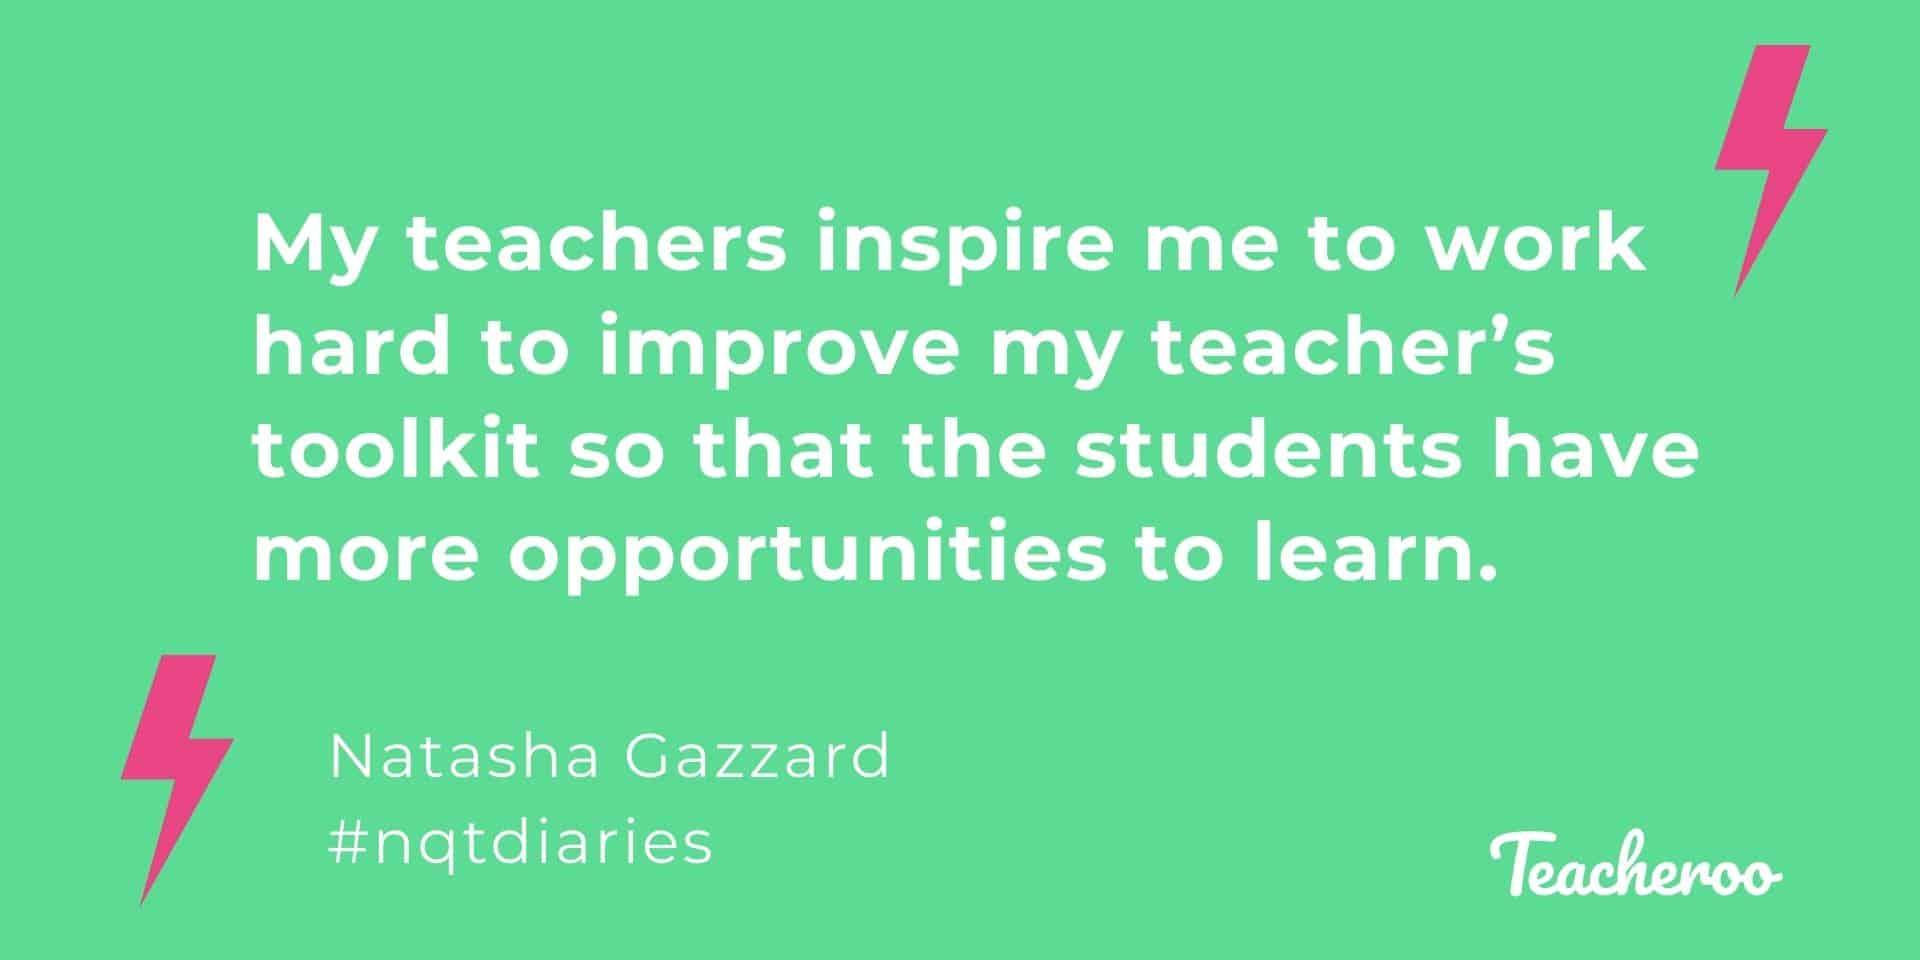 Natasha nqt diary quote - my teachers inspire me